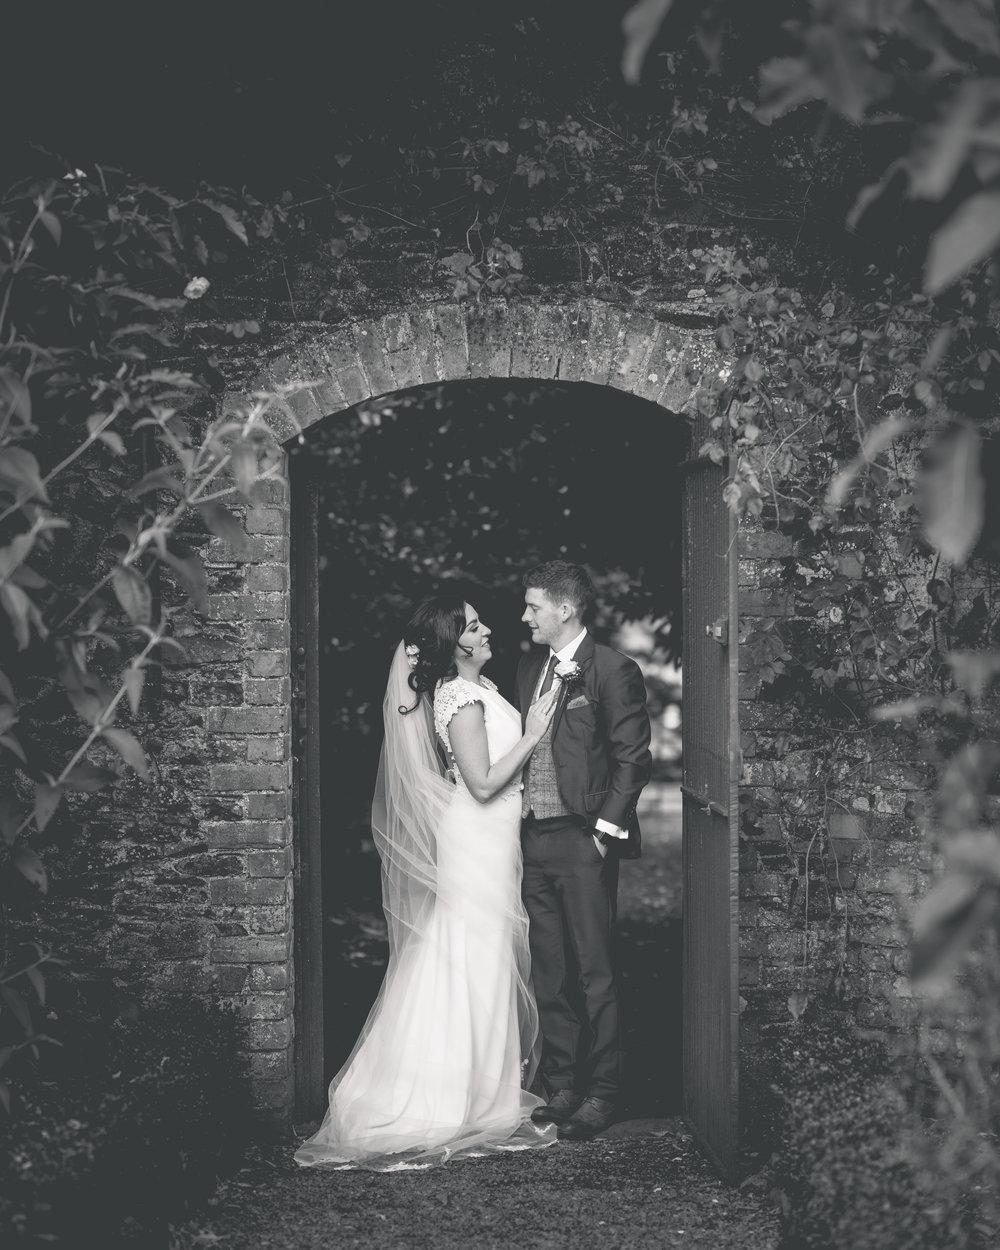 Brian McEwan Wedding Photography | Carol-Anne & Sean | The Portraits-43.jpg